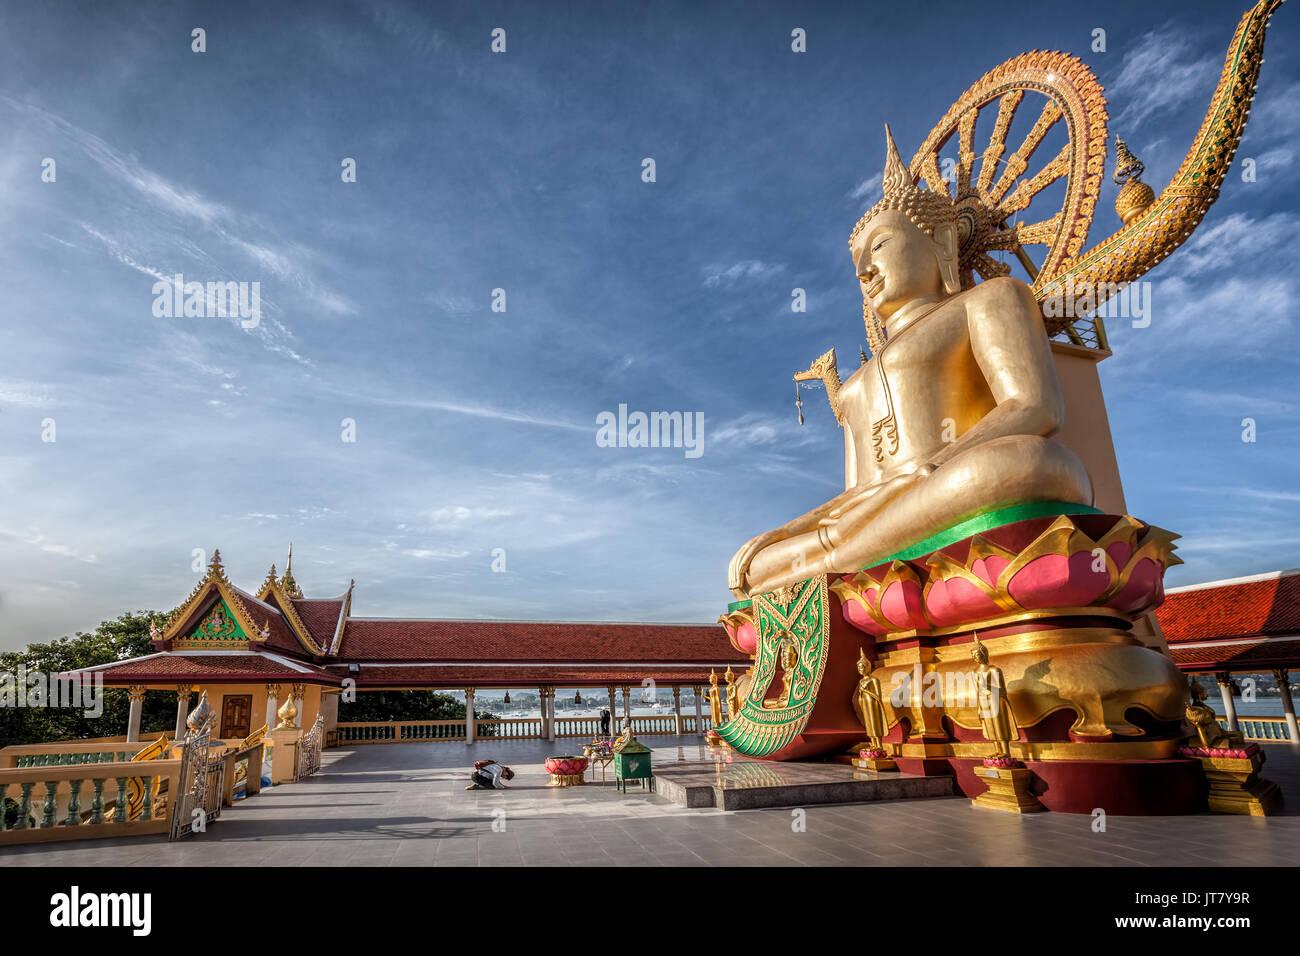 Thai buddhist girl praying in front of Big Buddha, Wat Phra Yai, Kho Samui island, Thailand - Stock Image